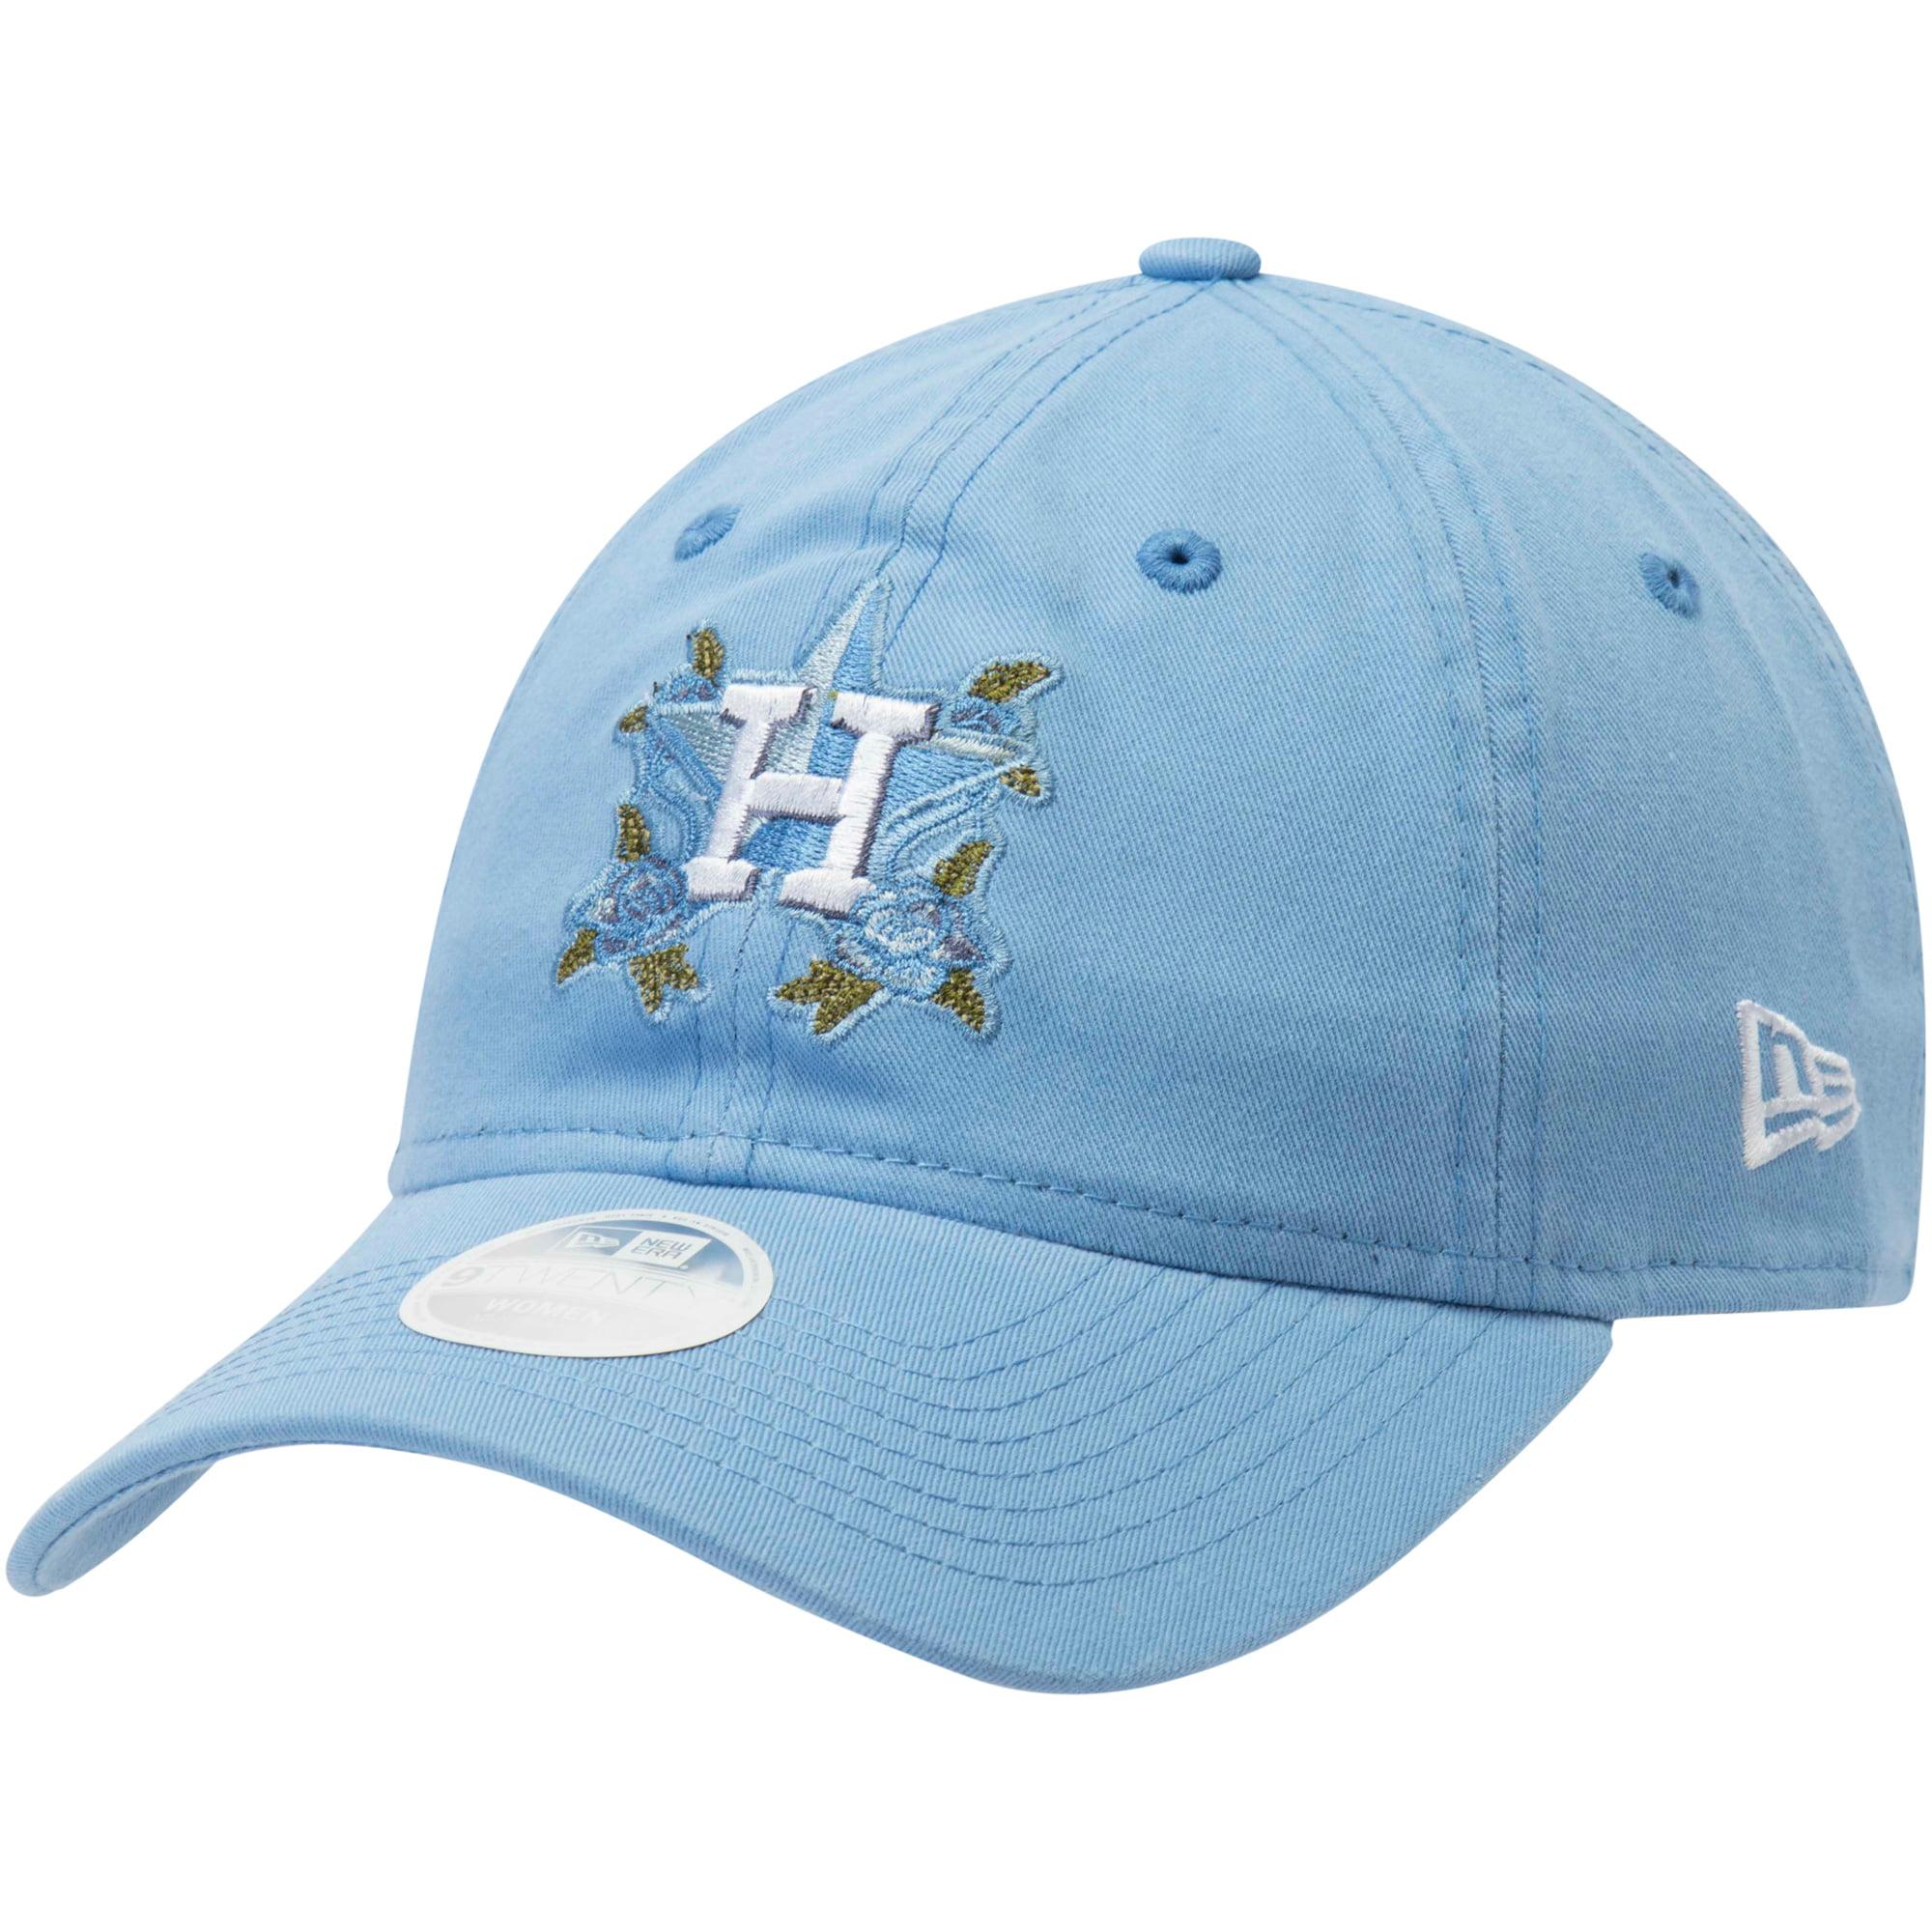 Houston Astros New Era Women's Bloom 9TWENTY Adjustable Hat - Blue - OSFA